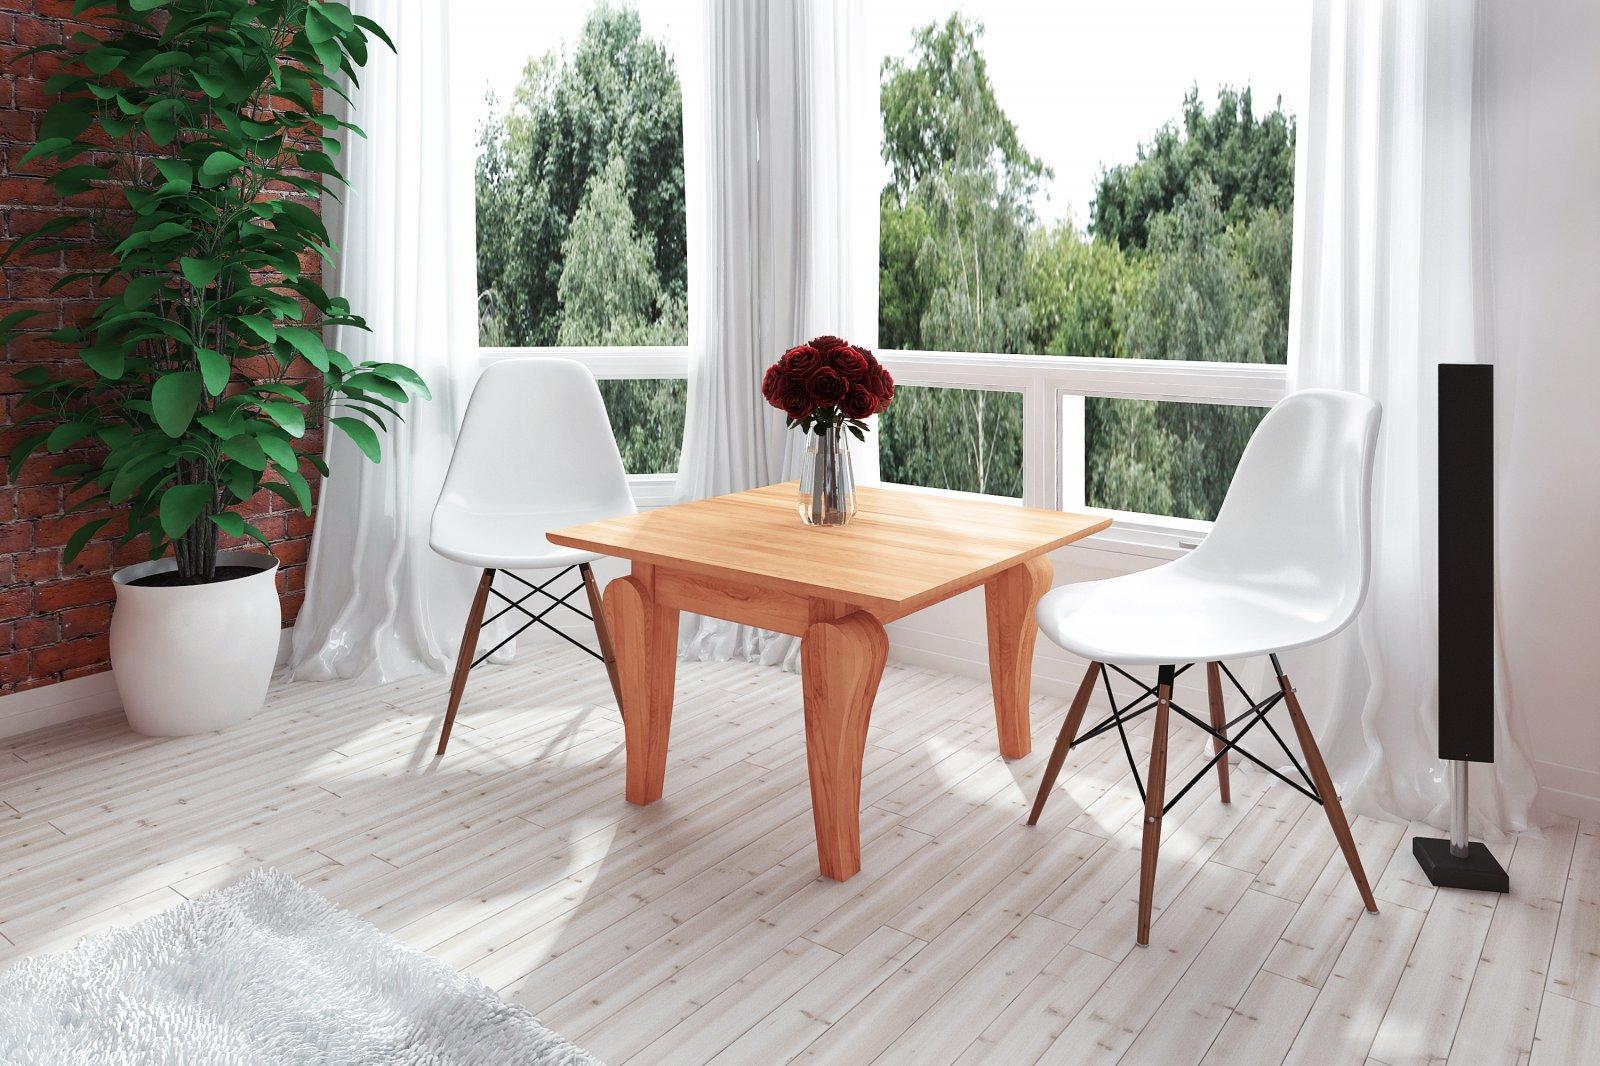 Stolik BONA z litego drewna